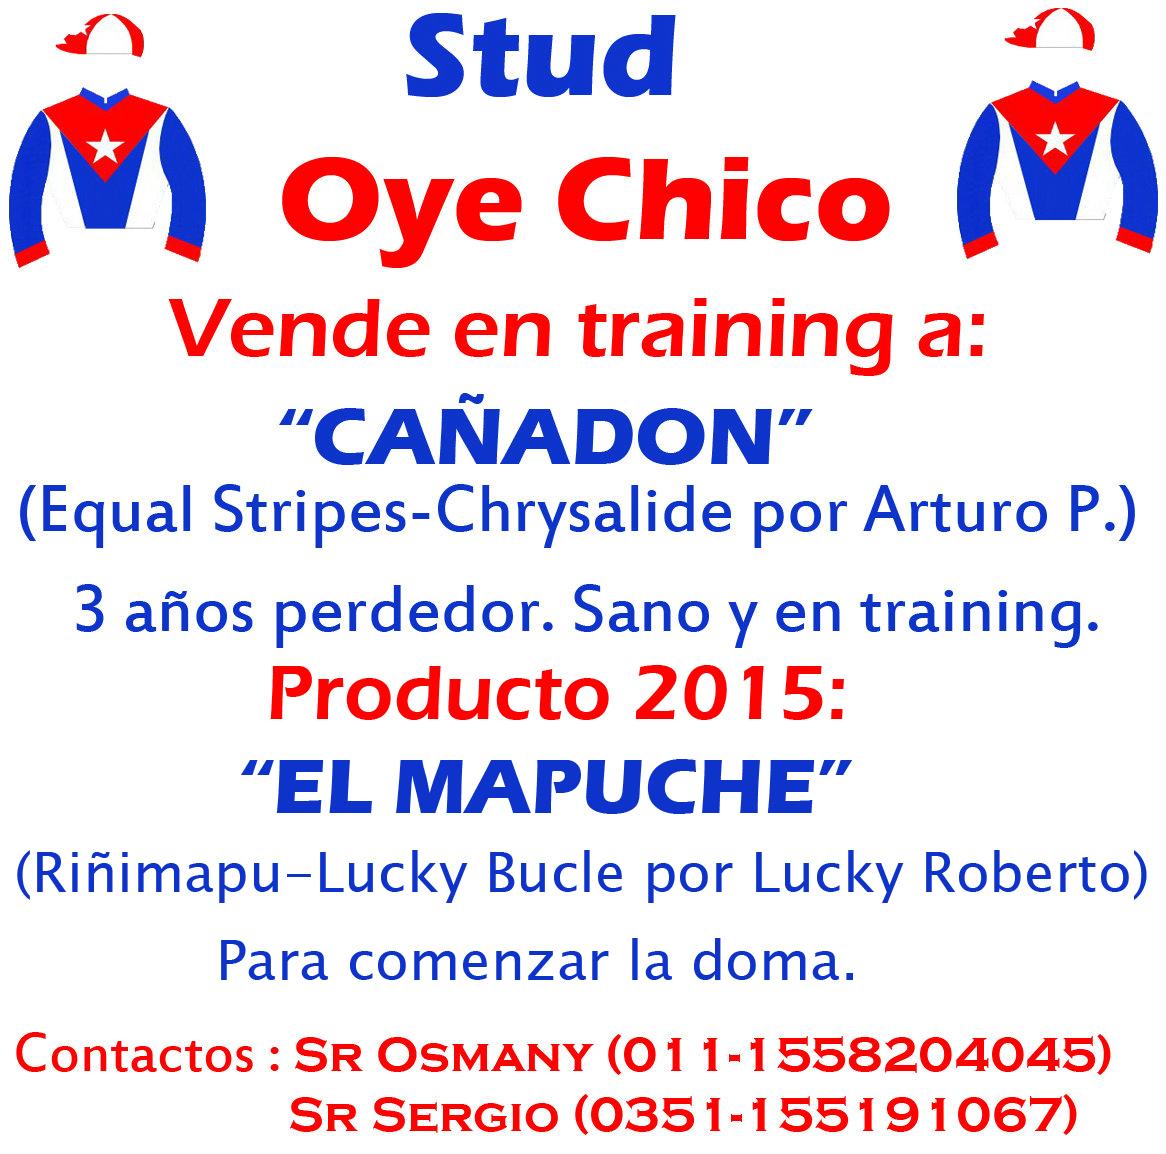 OYE CHICO 2